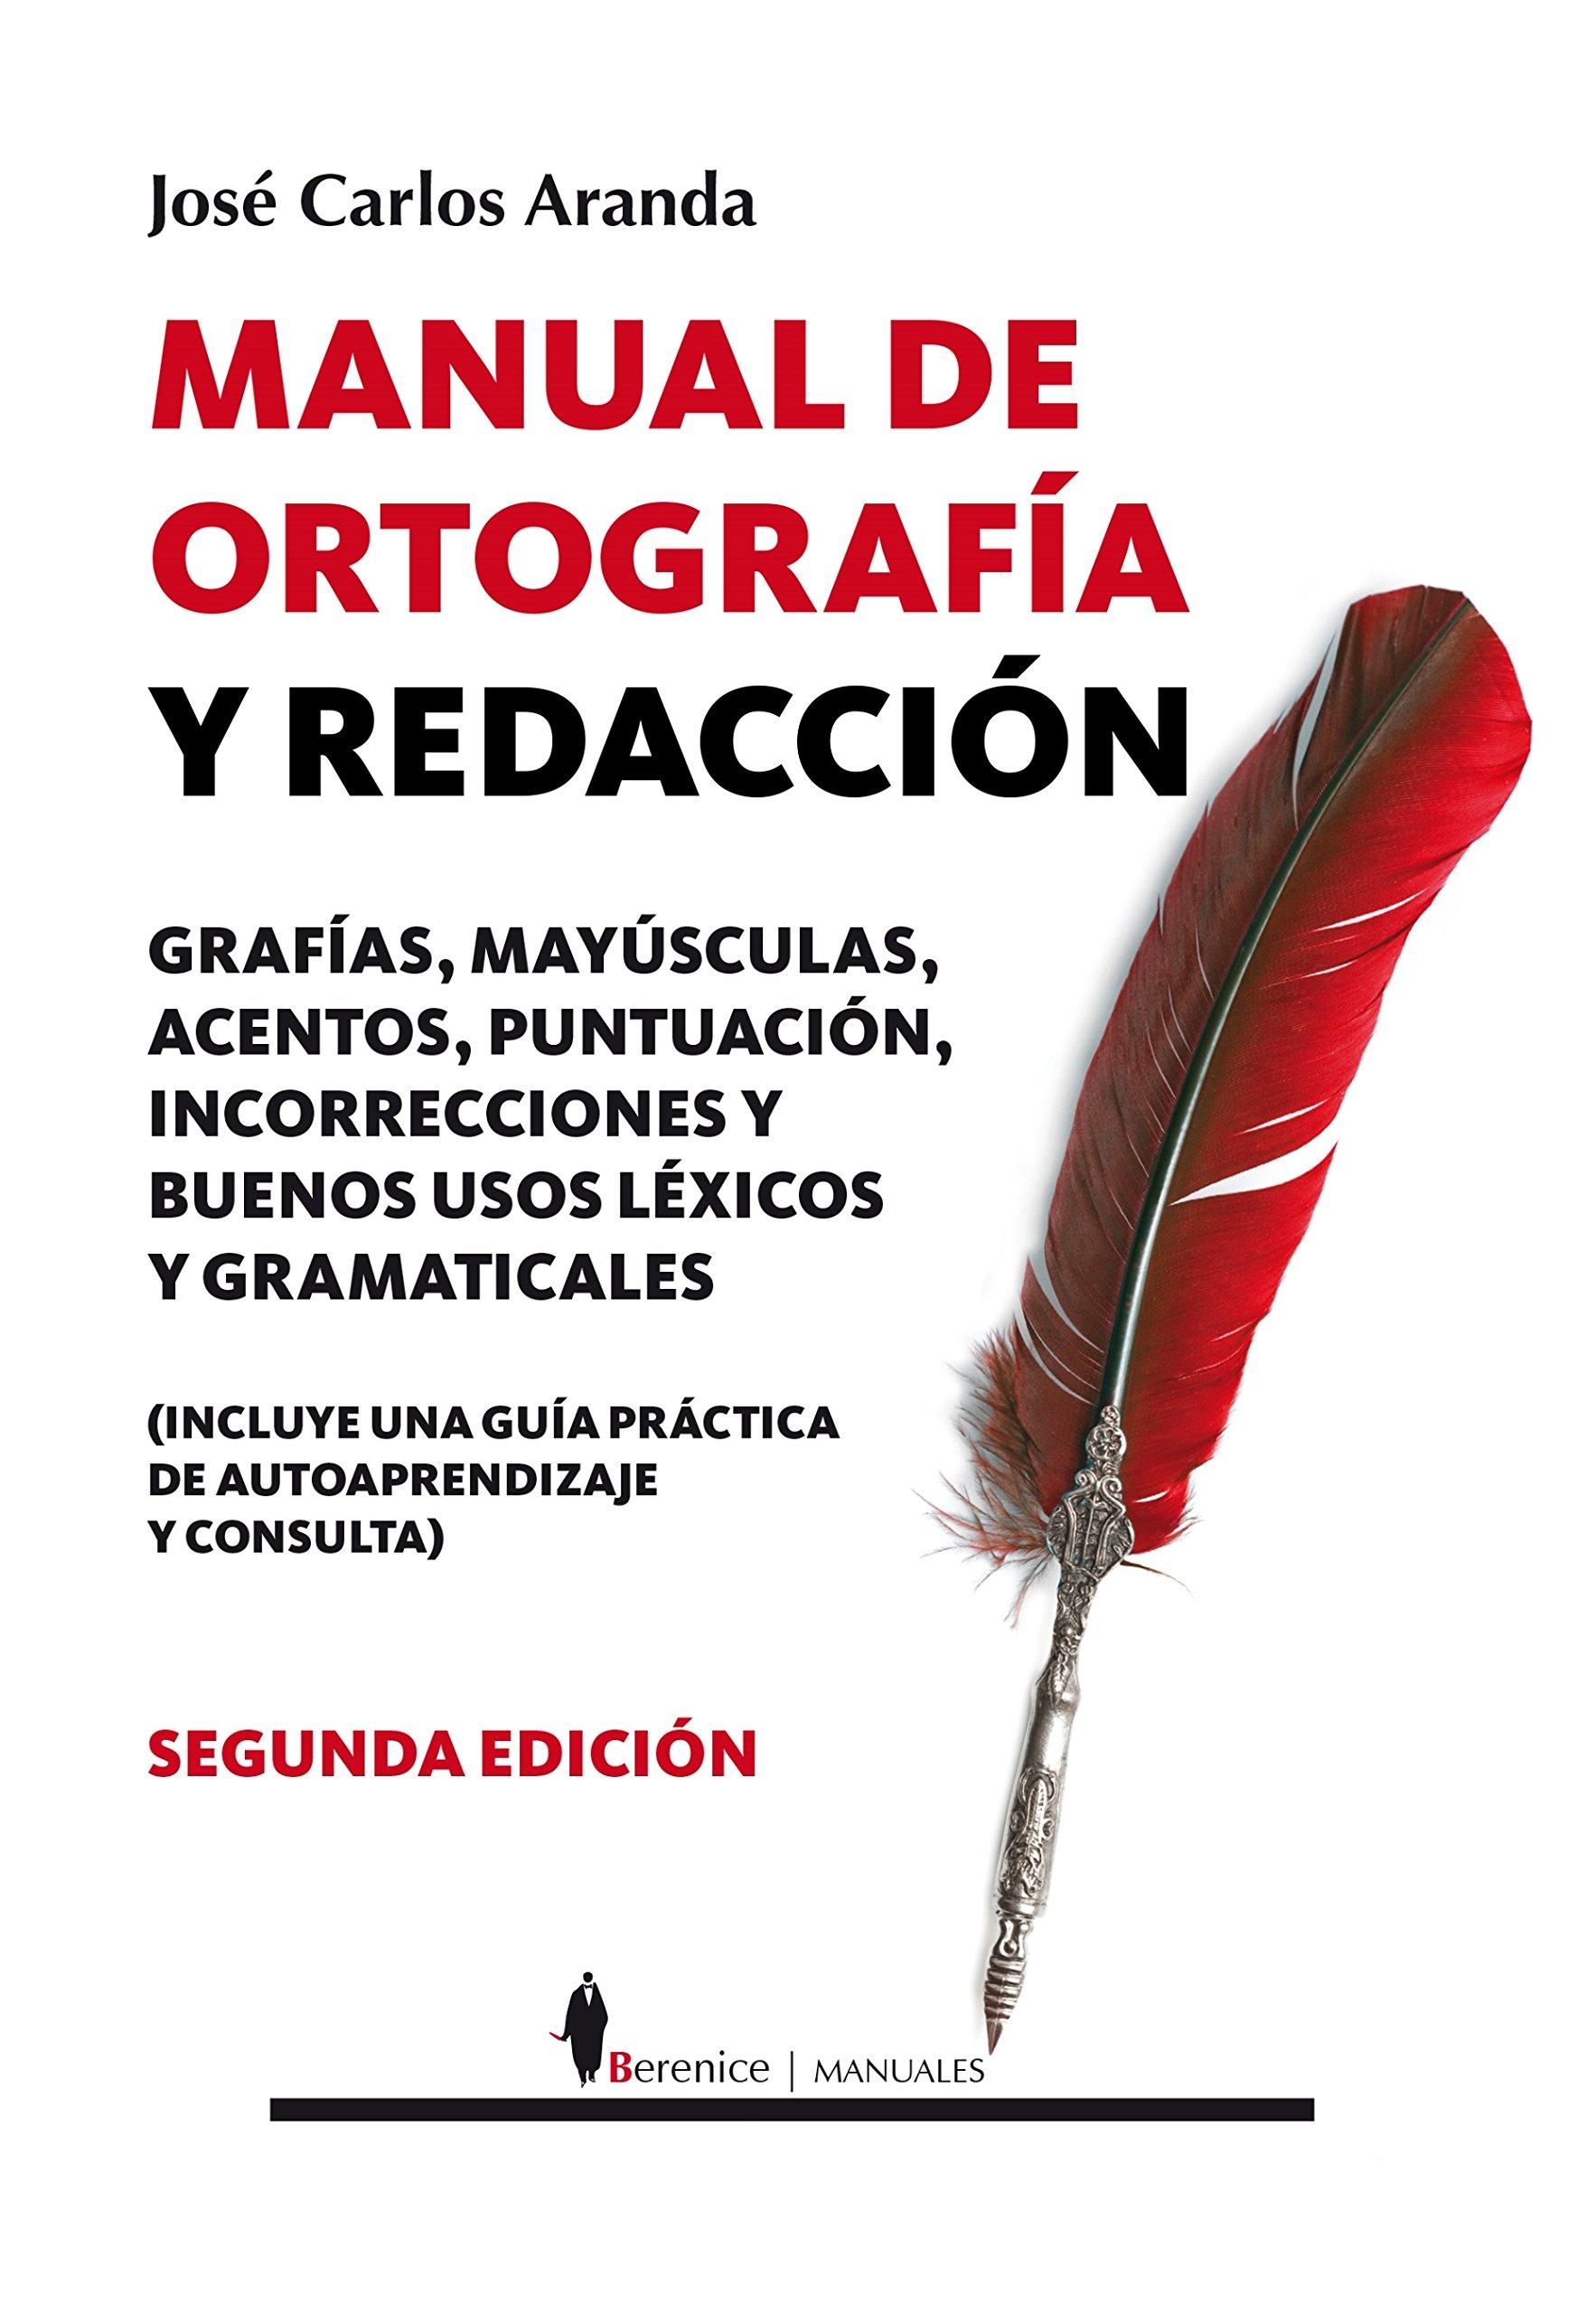 Manual de ortografia y redaccion (Spanish Edition): Jose Carlos Aranda:  9788496756670: Amazon.com: Books